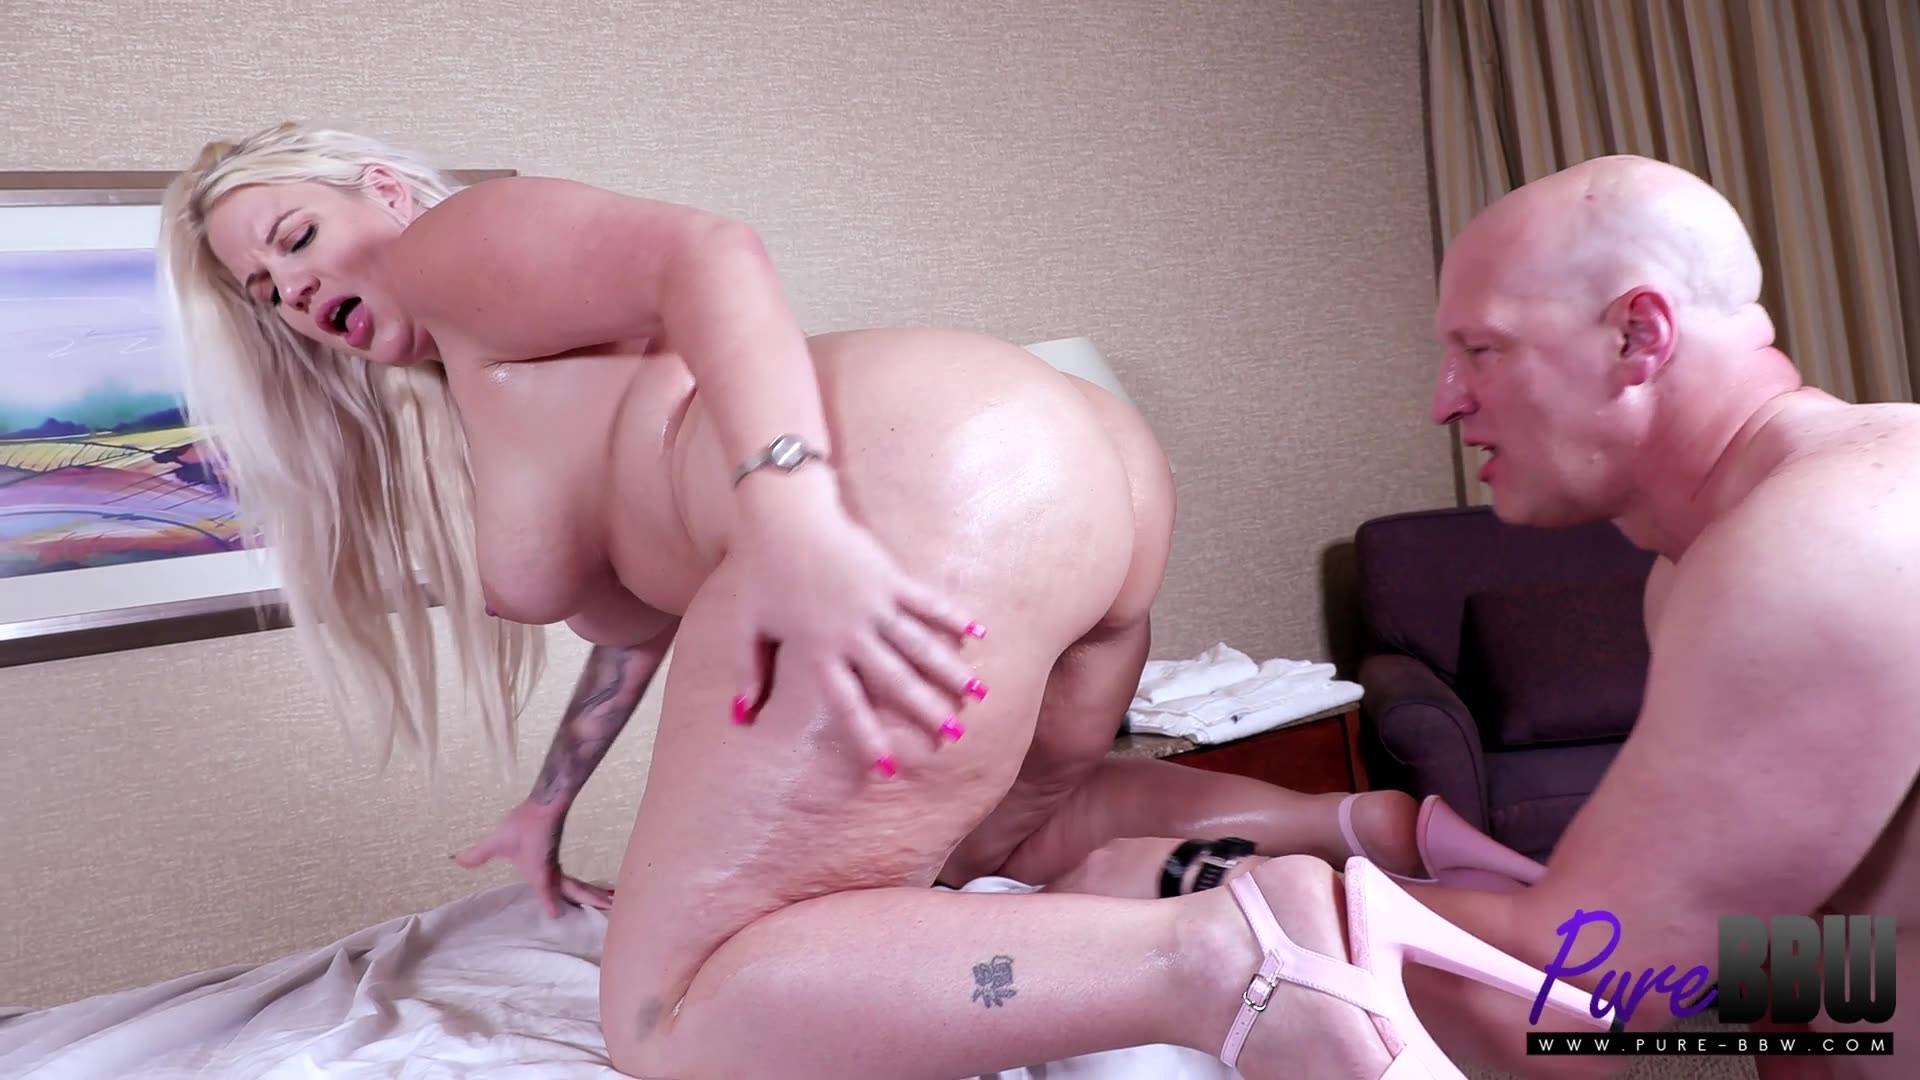 Pure-BBW.21.07.21.LuckyB.Dallas.Big.Booty.Sexual.Massage.XXX.1080p.MP4-OiLED.jpg